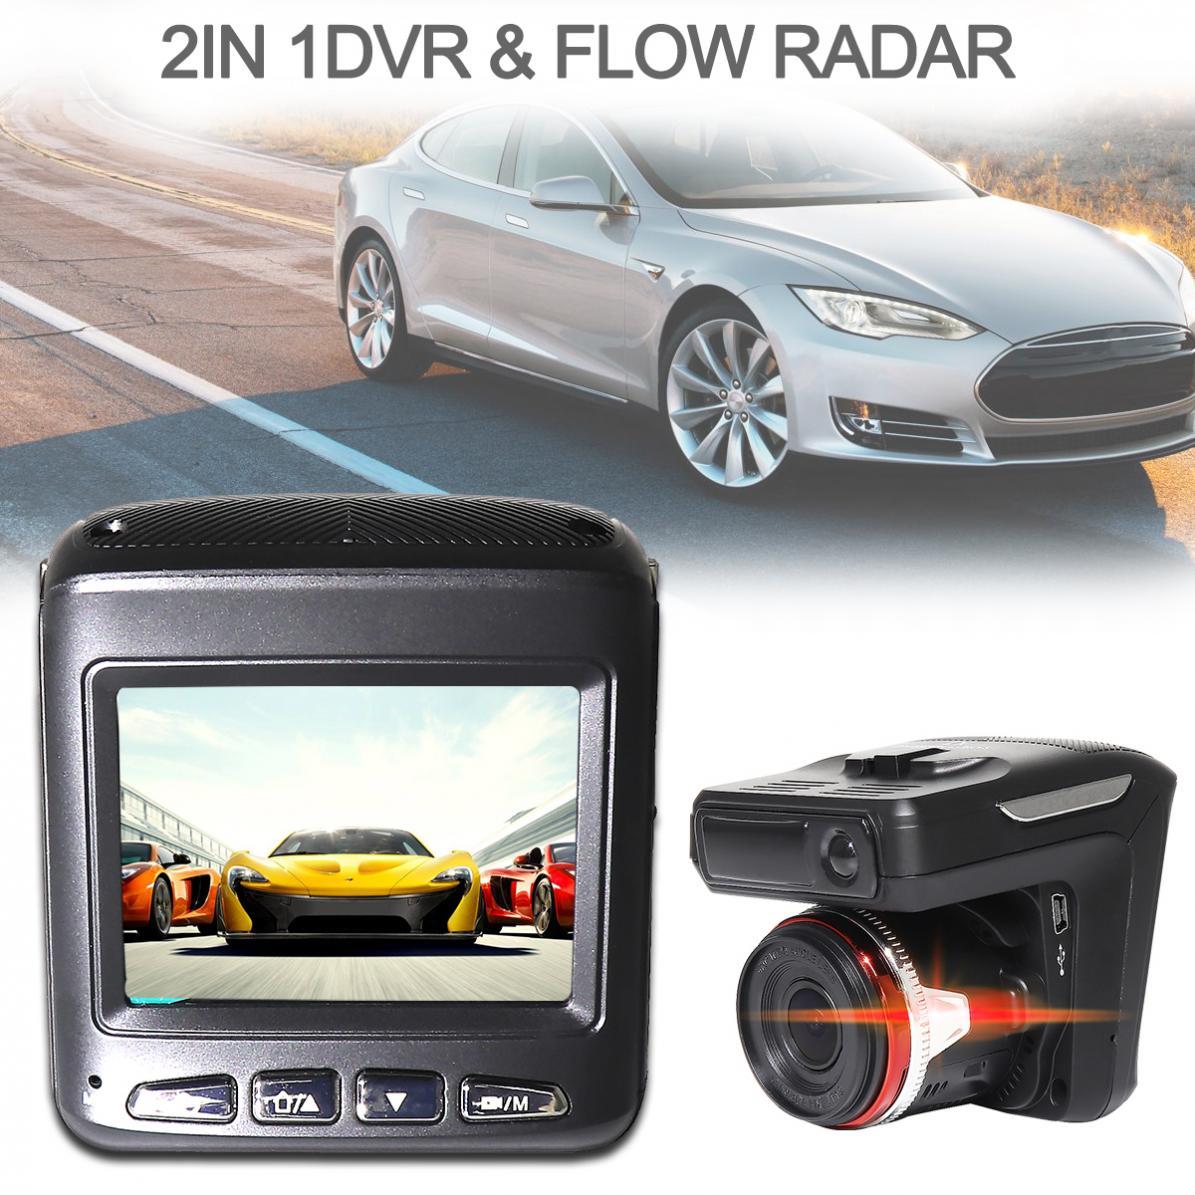 2 en 1 voiture DVR Radar détecteur g-senor voiture-détecteur caméra HD 1280P vitesse caméra détecteur Antiradar russe/anglais langue